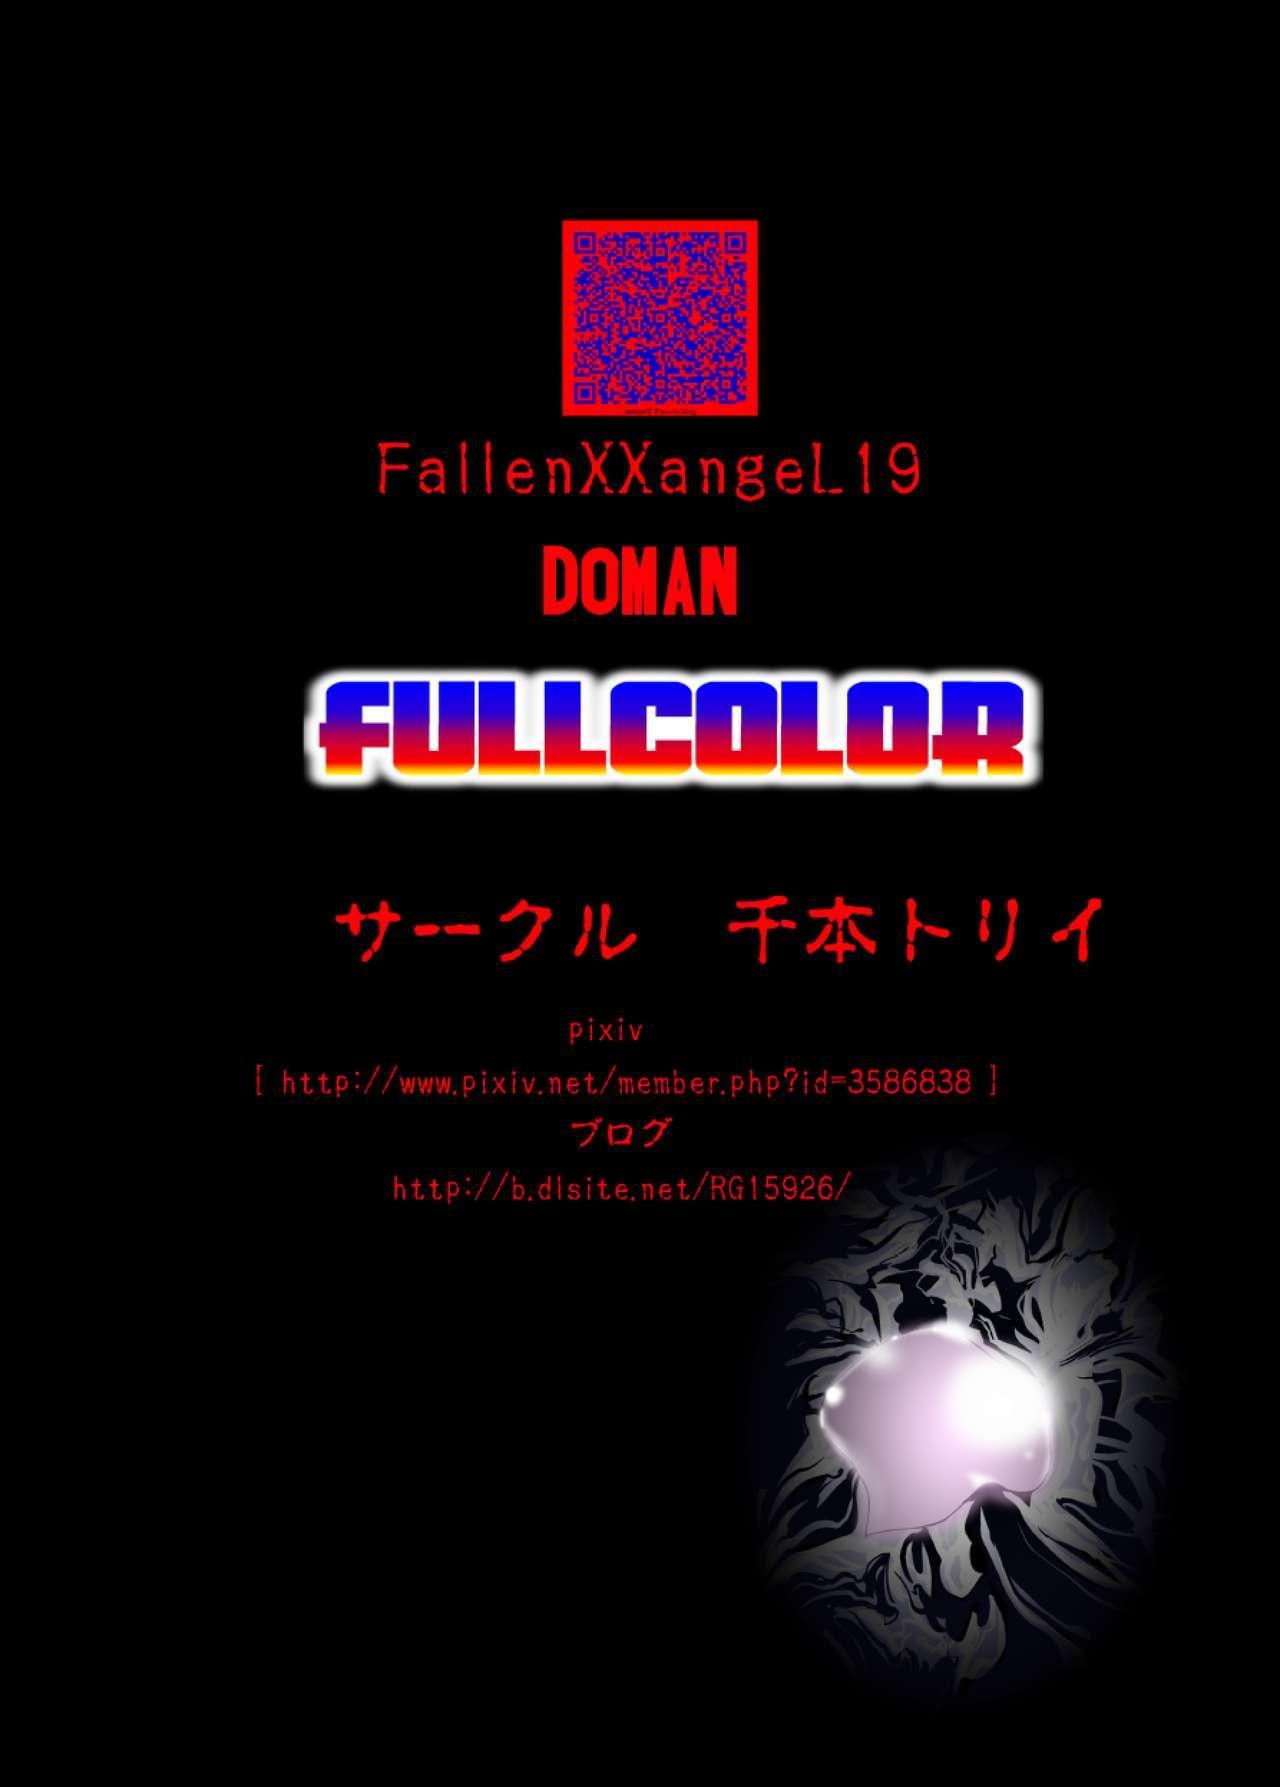 FallenXXangeL 19 Doman FULLCOLOR 55